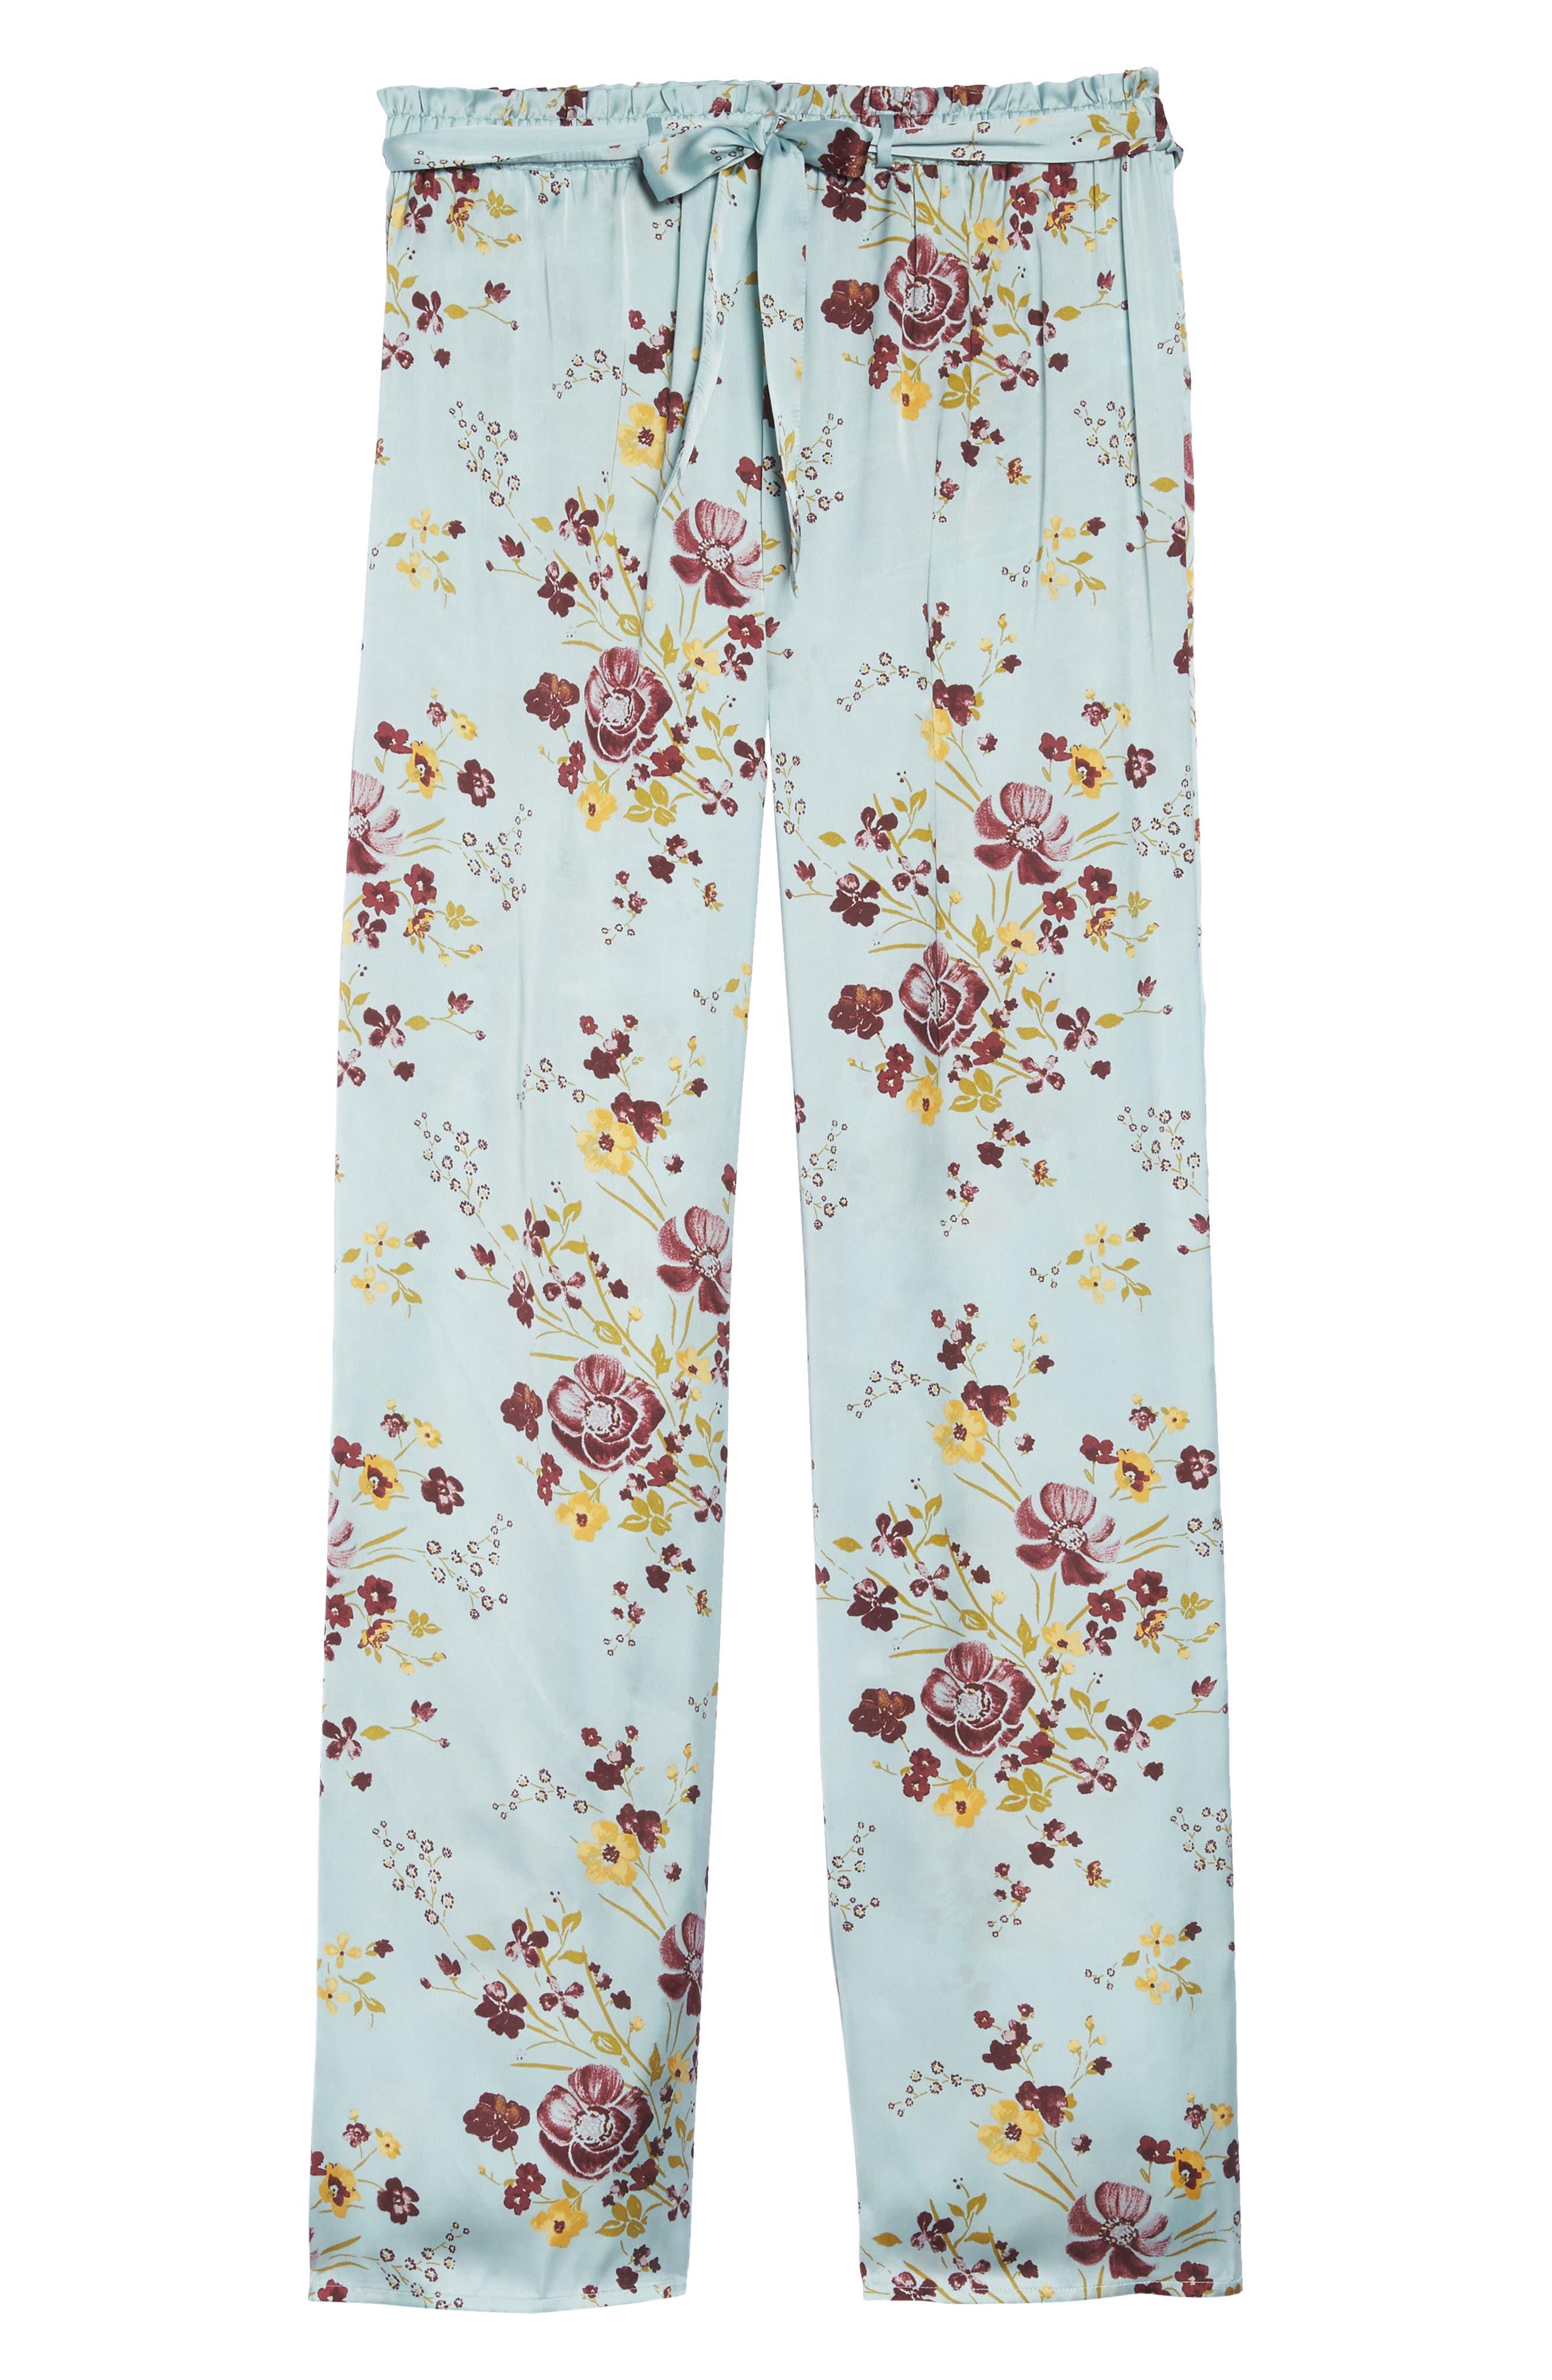 In My Dreams Pajama Pants,                             Alternate thumbnail 4, color,                             Blue Cloud Pretty Floral